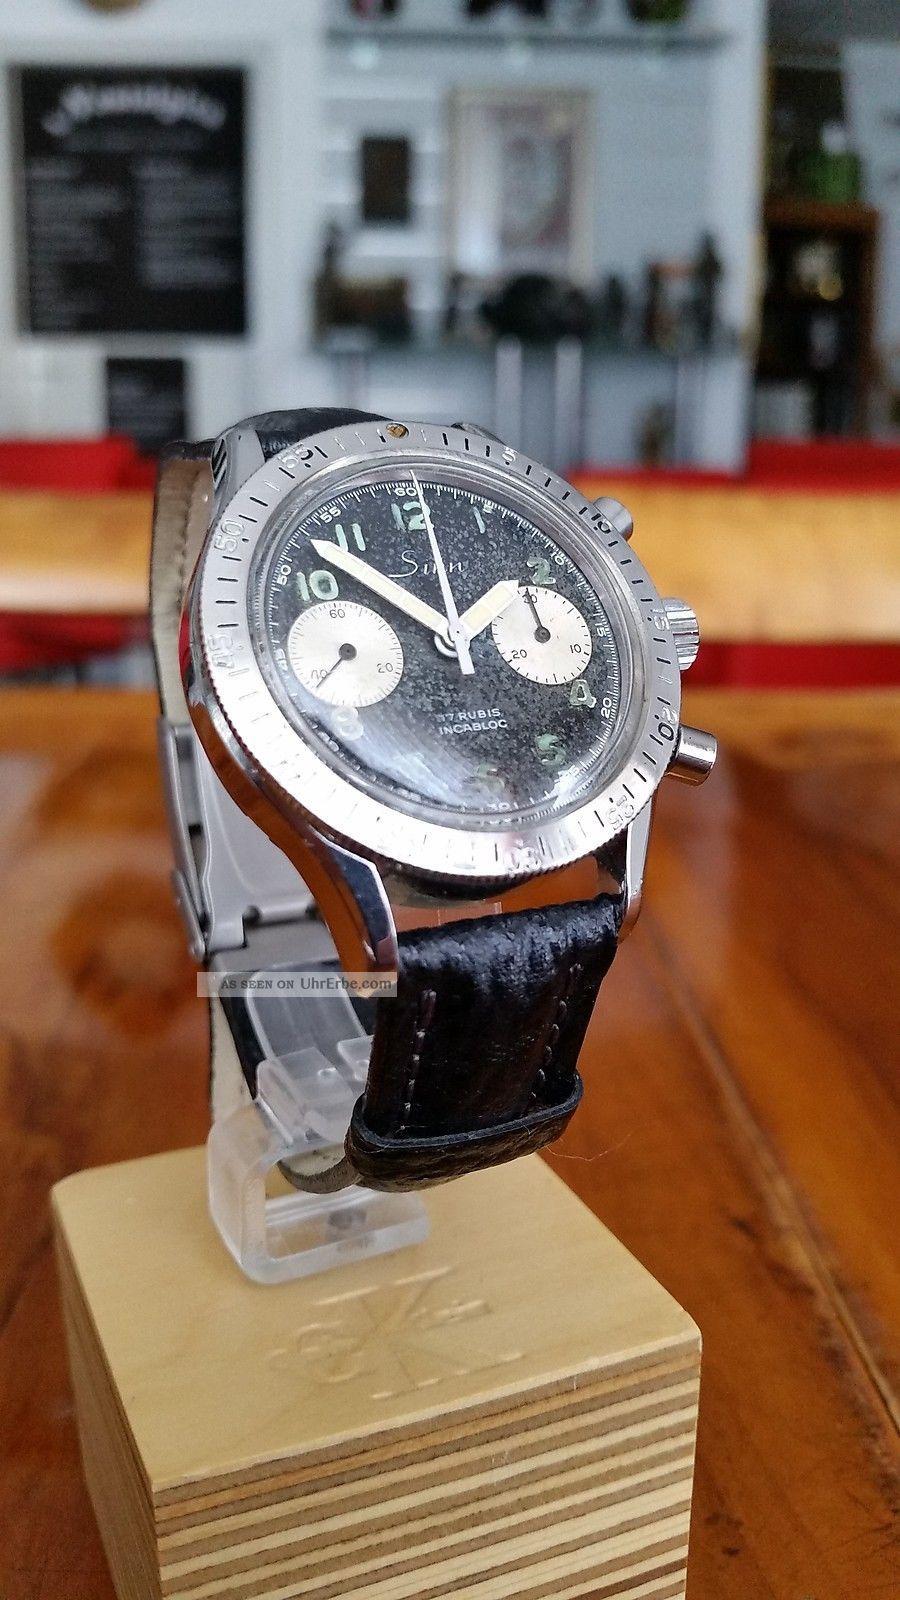 Orig.  Sinn 101/102 Bicompax Chronograph - Extrem Selten - Landeron 248 Armbanduhren Bild